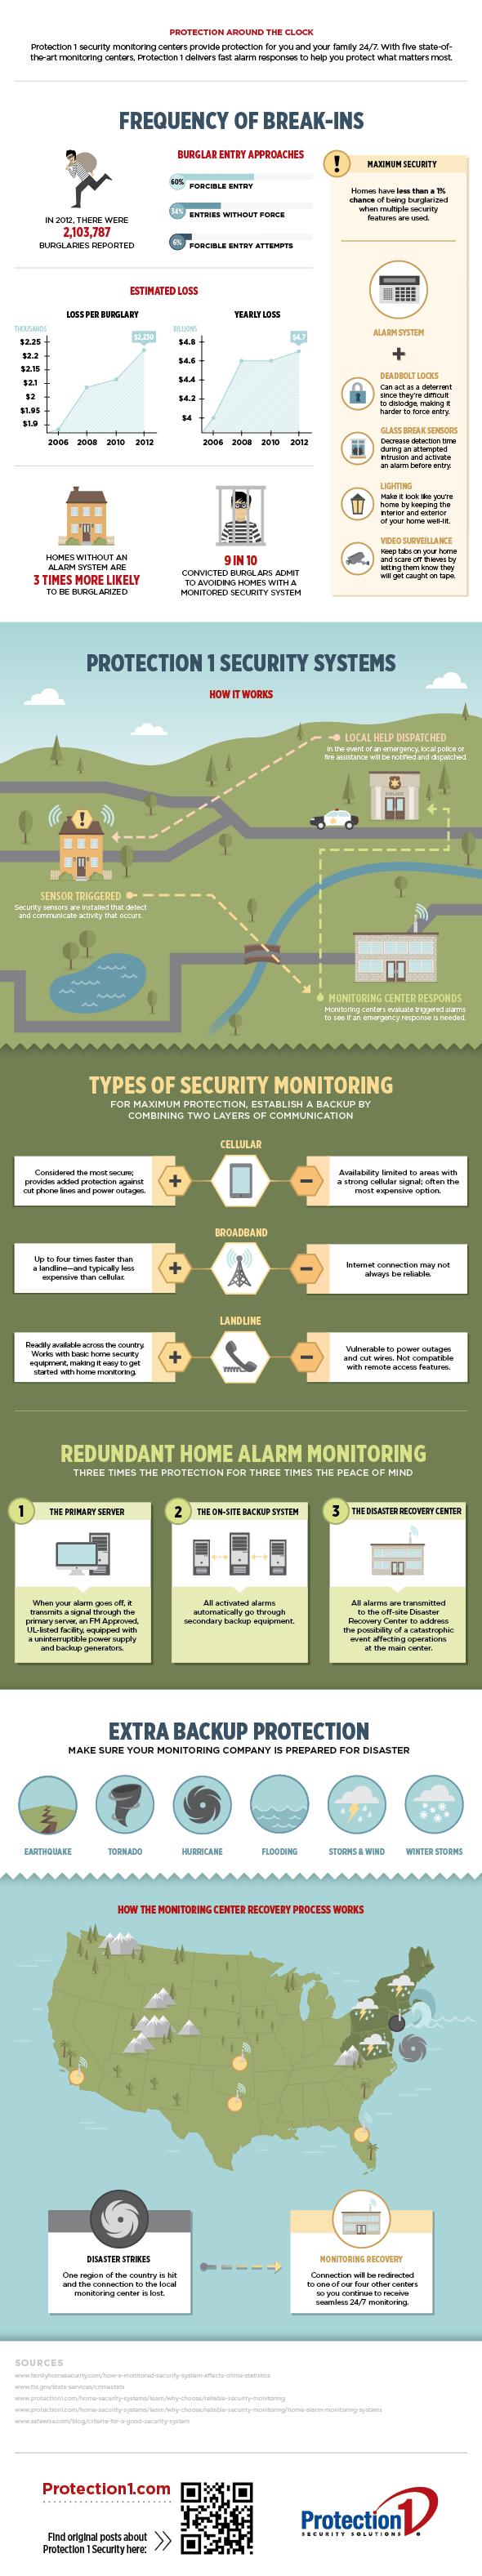 Lawmate HD WiFi Camera Clock wNight Vision Security monitoring